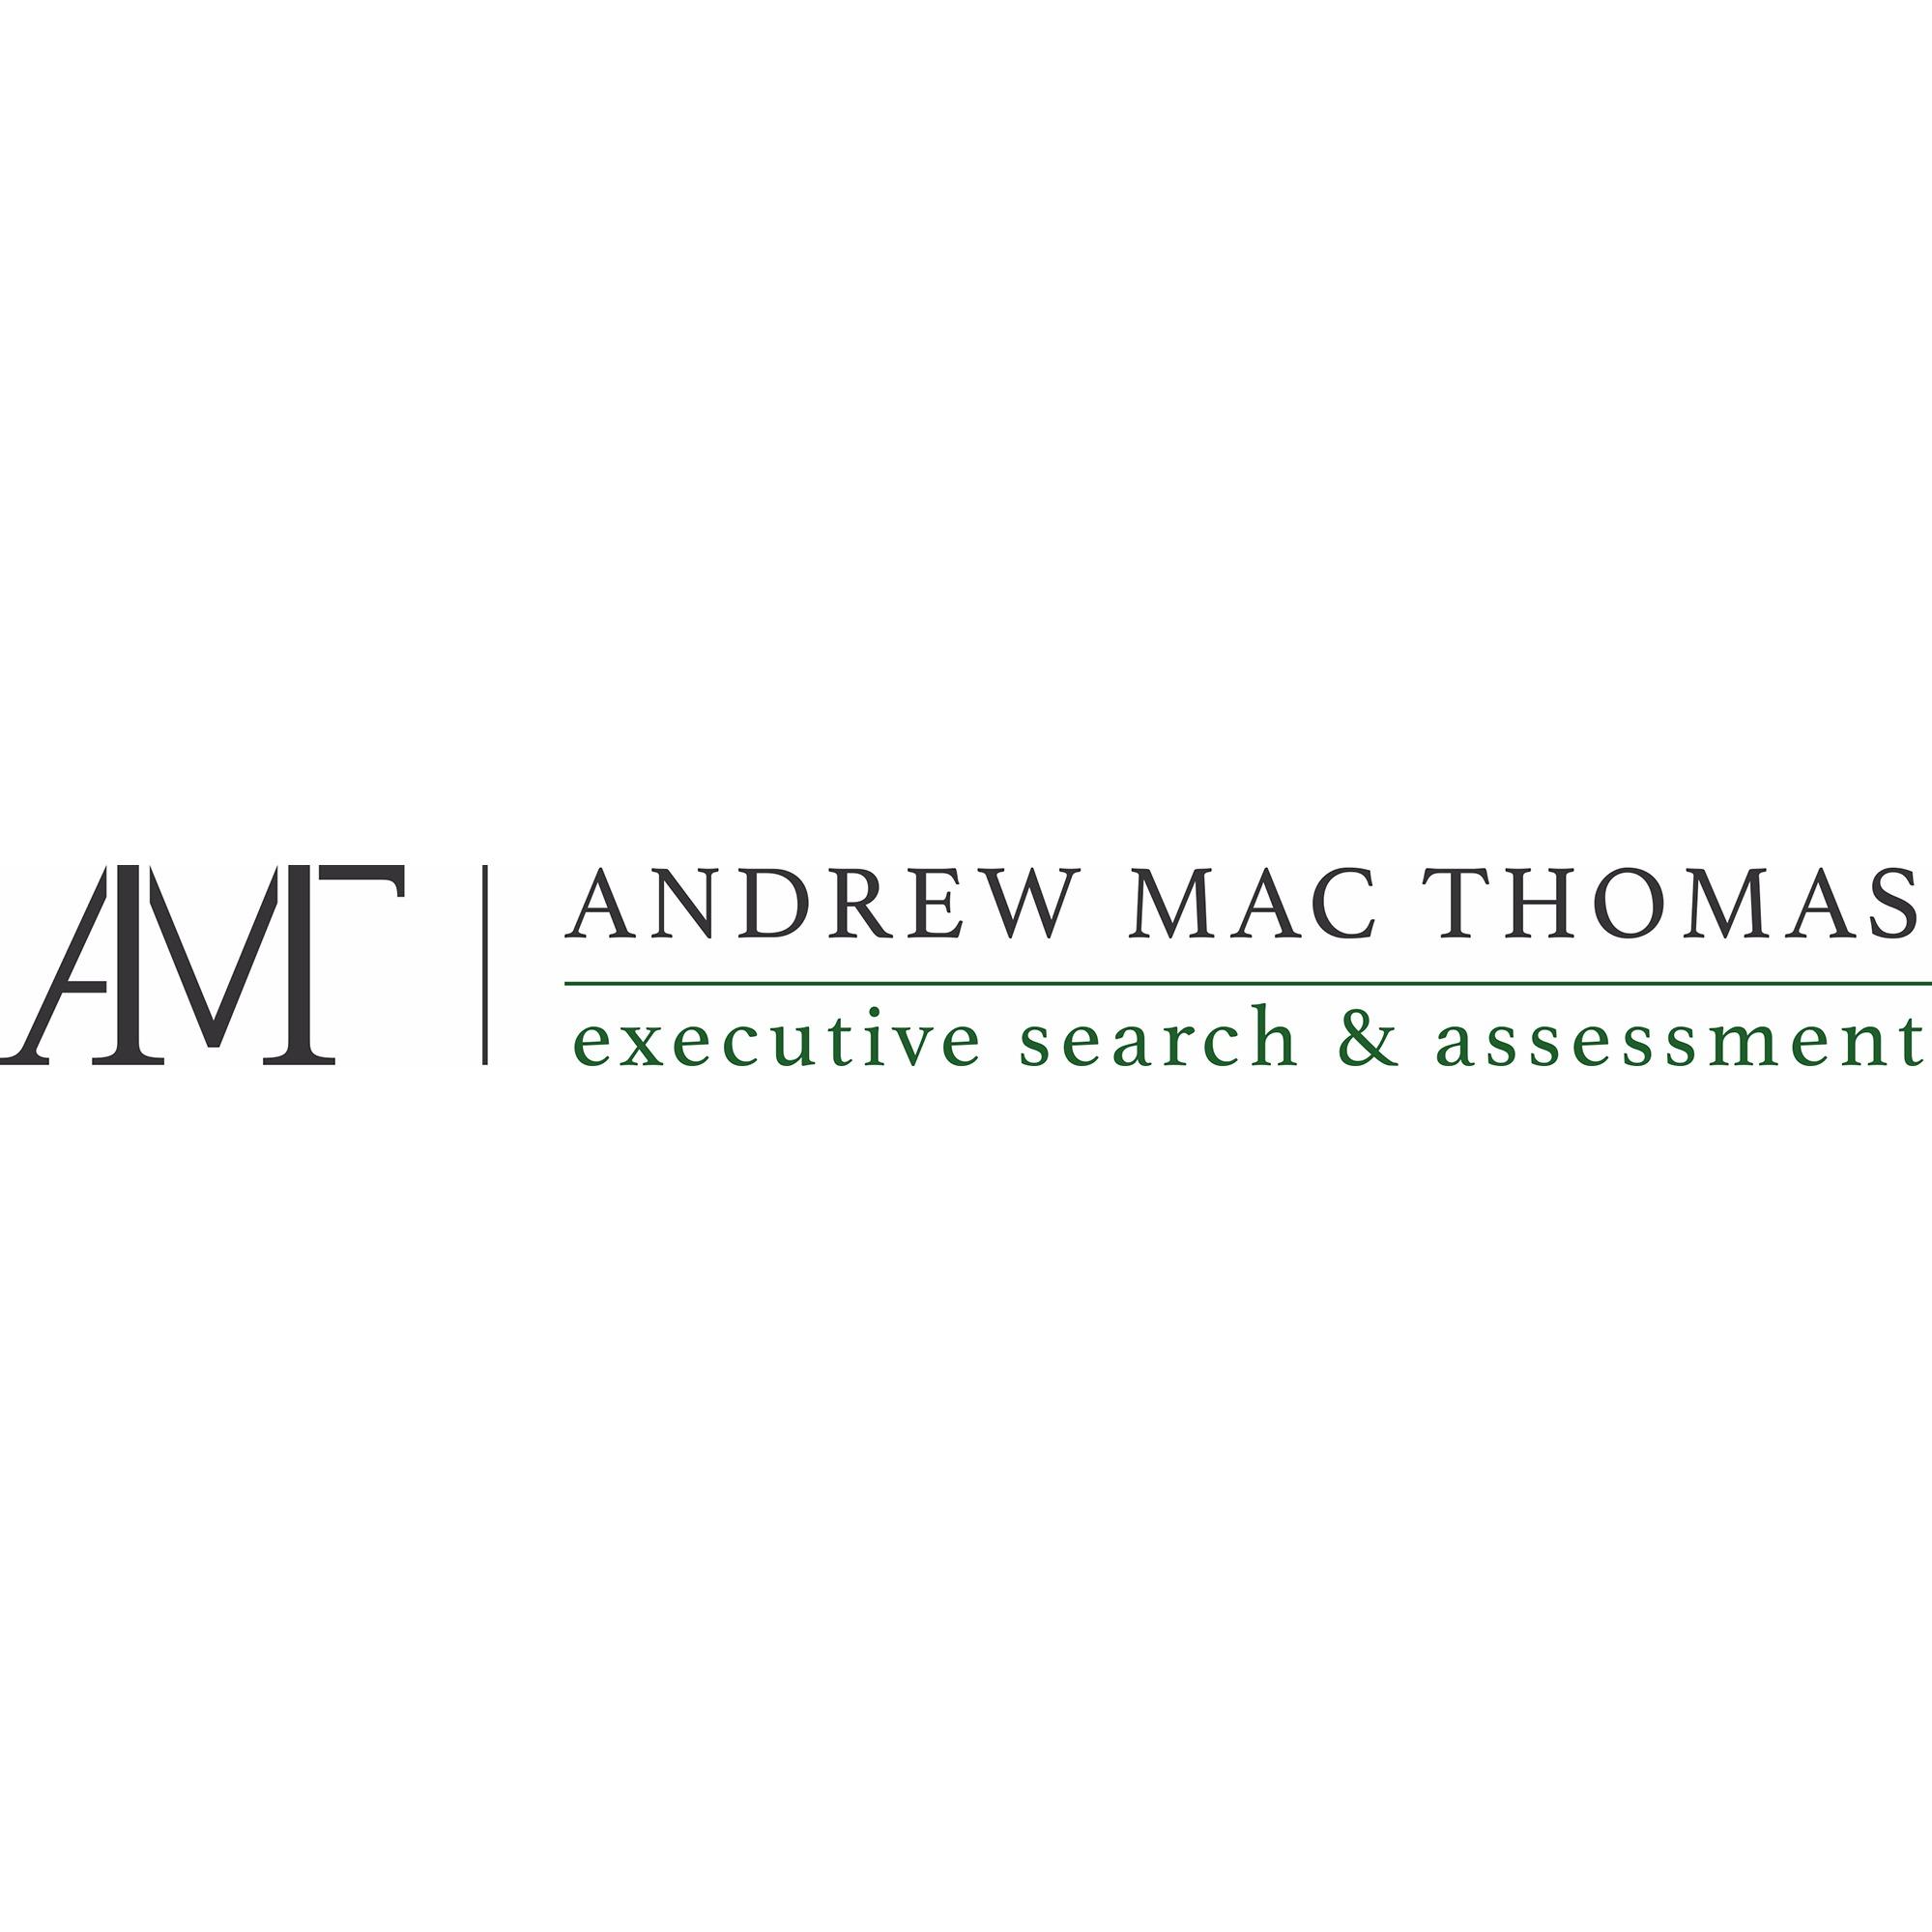 the Andrew Mac Thomas logo.